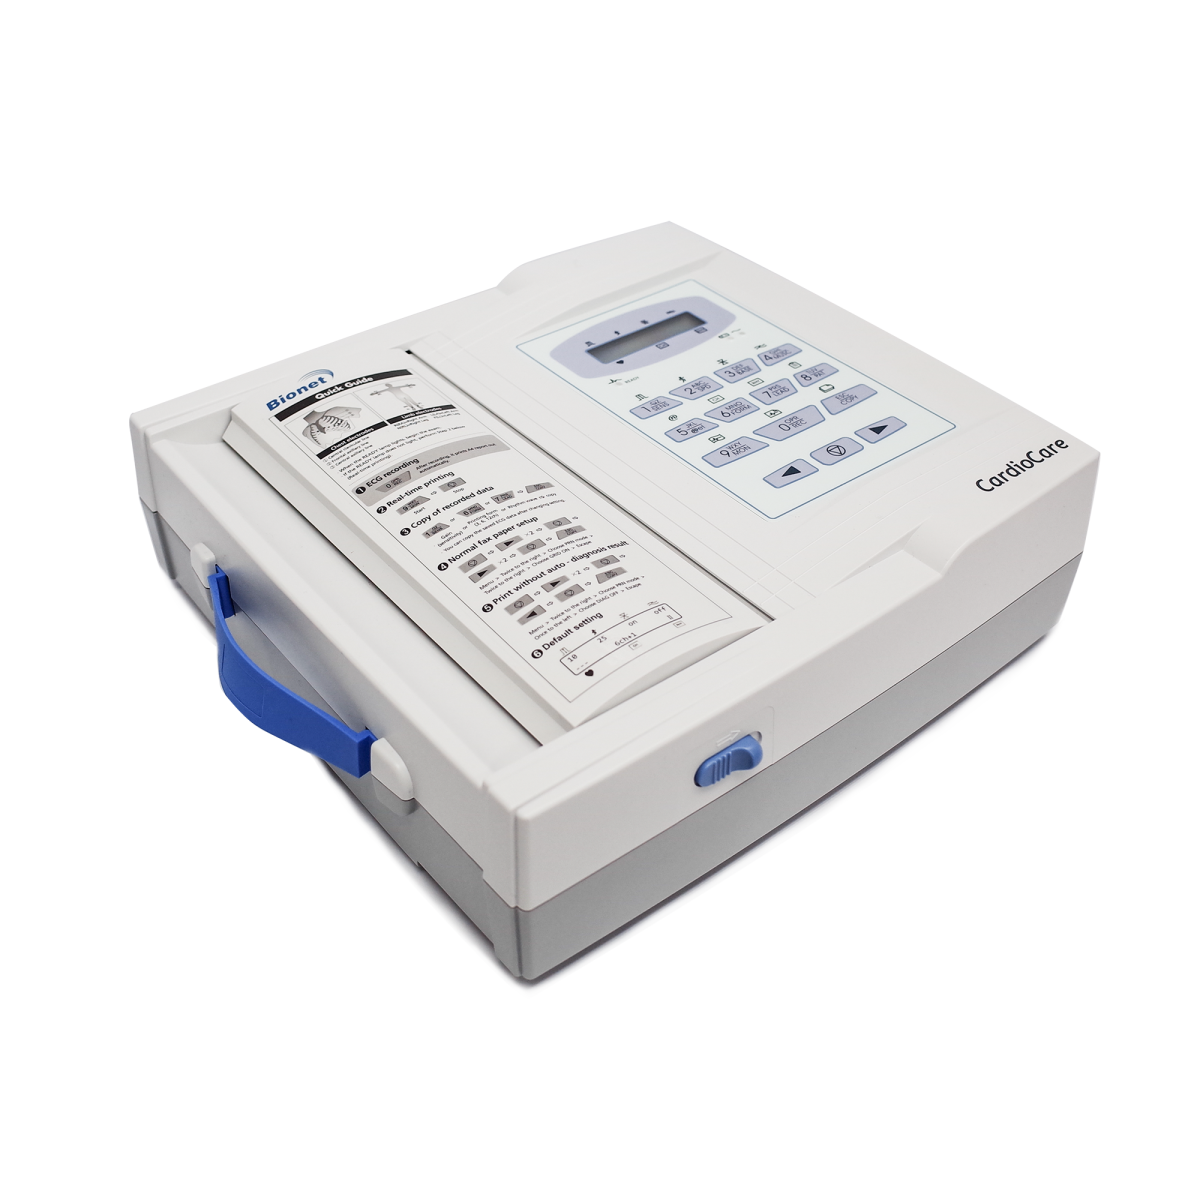 Bionet CardioCare 2000